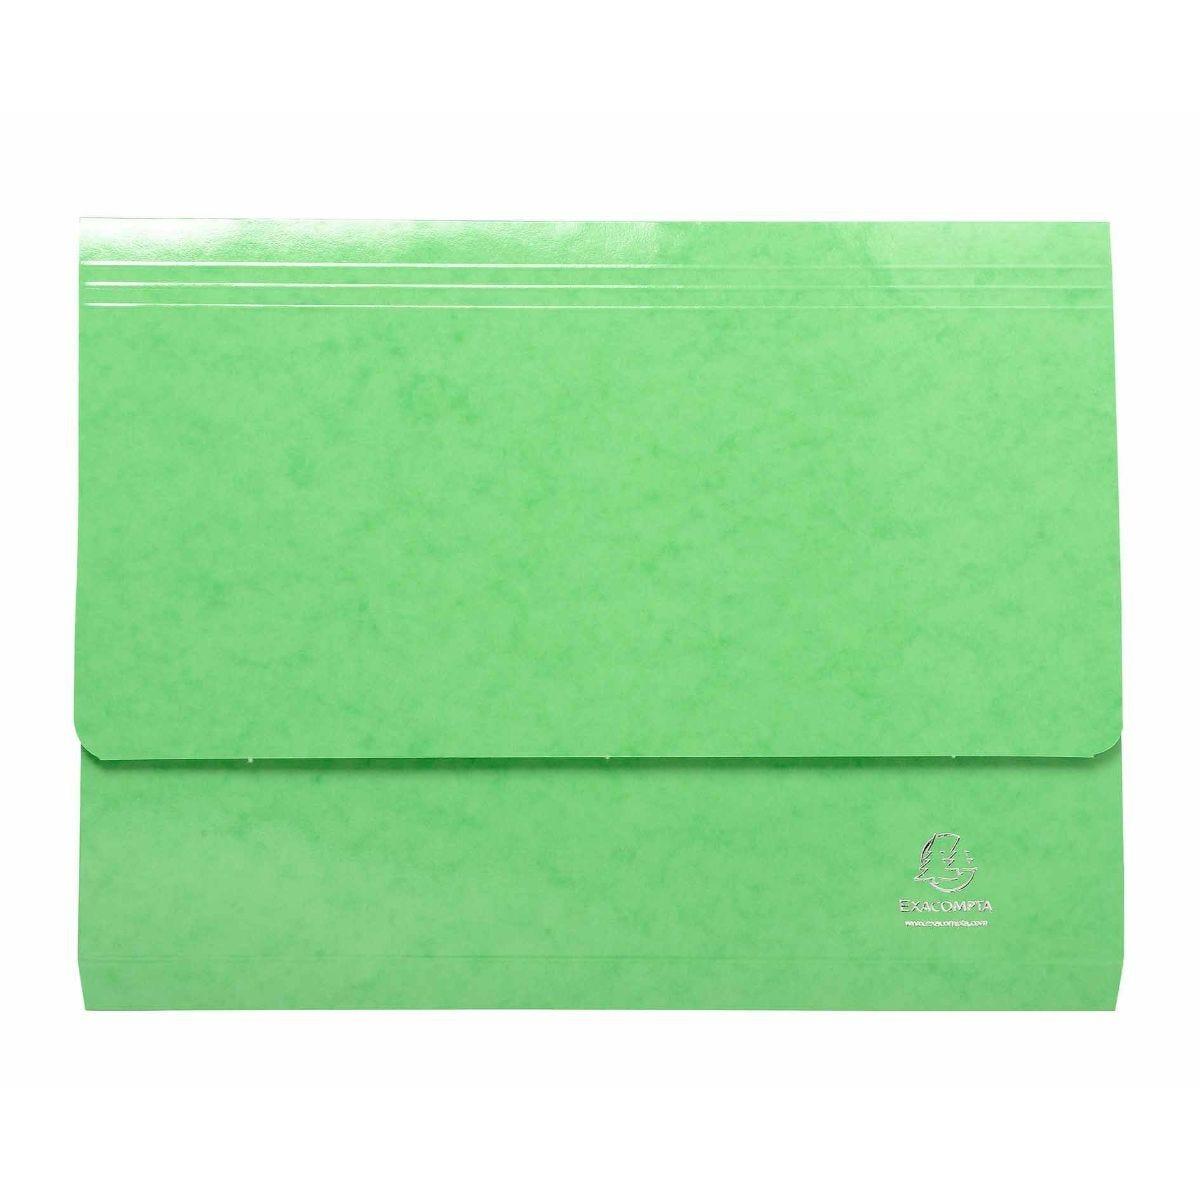 Exacompta Iderama Document Wallet Foolscap Pack of 25 265gsm Green